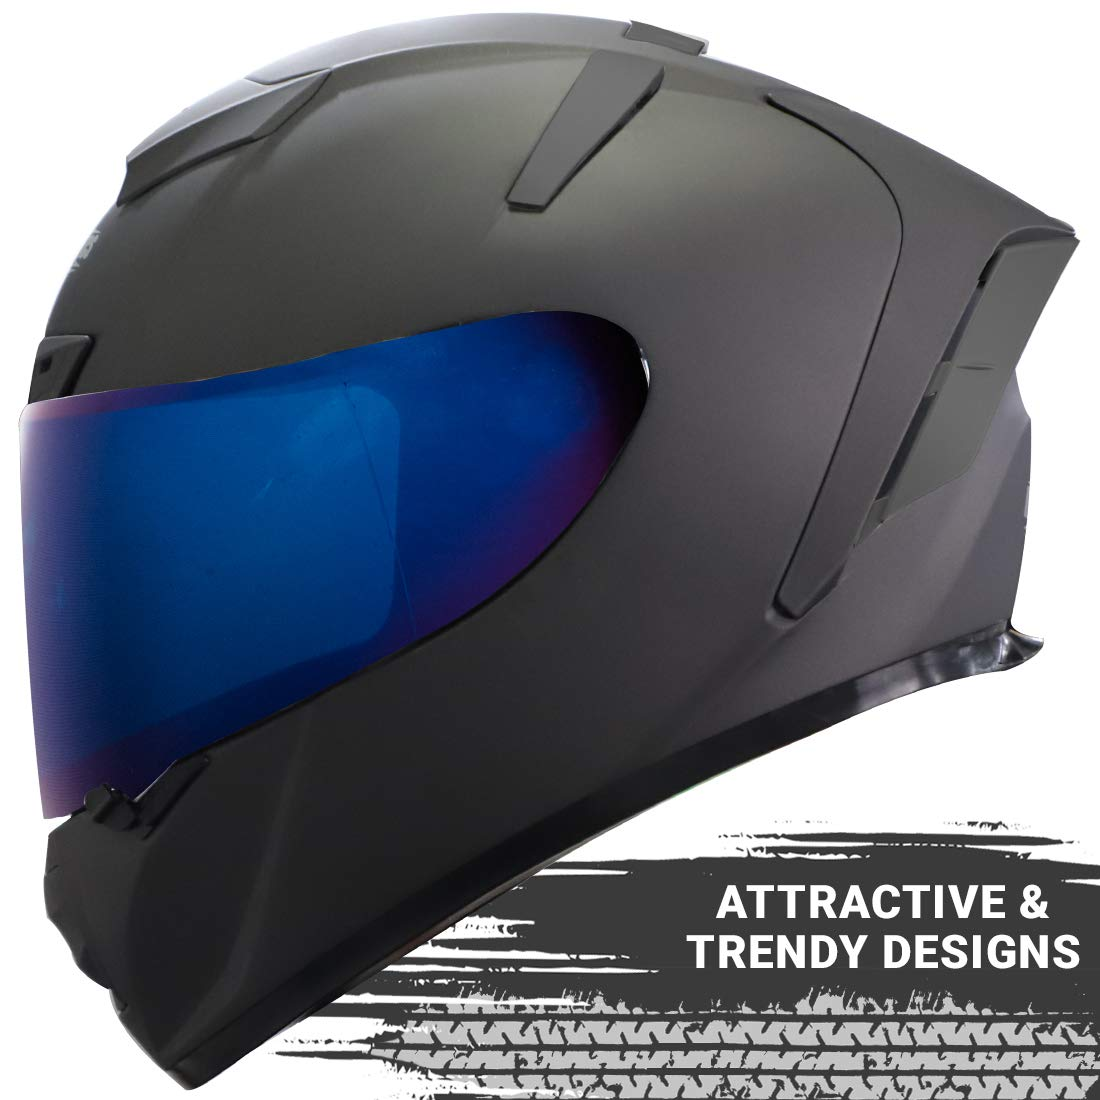 Stylish Matt Axis Grey with Blue Visor Steelbird SA-2 7Wings Helmet